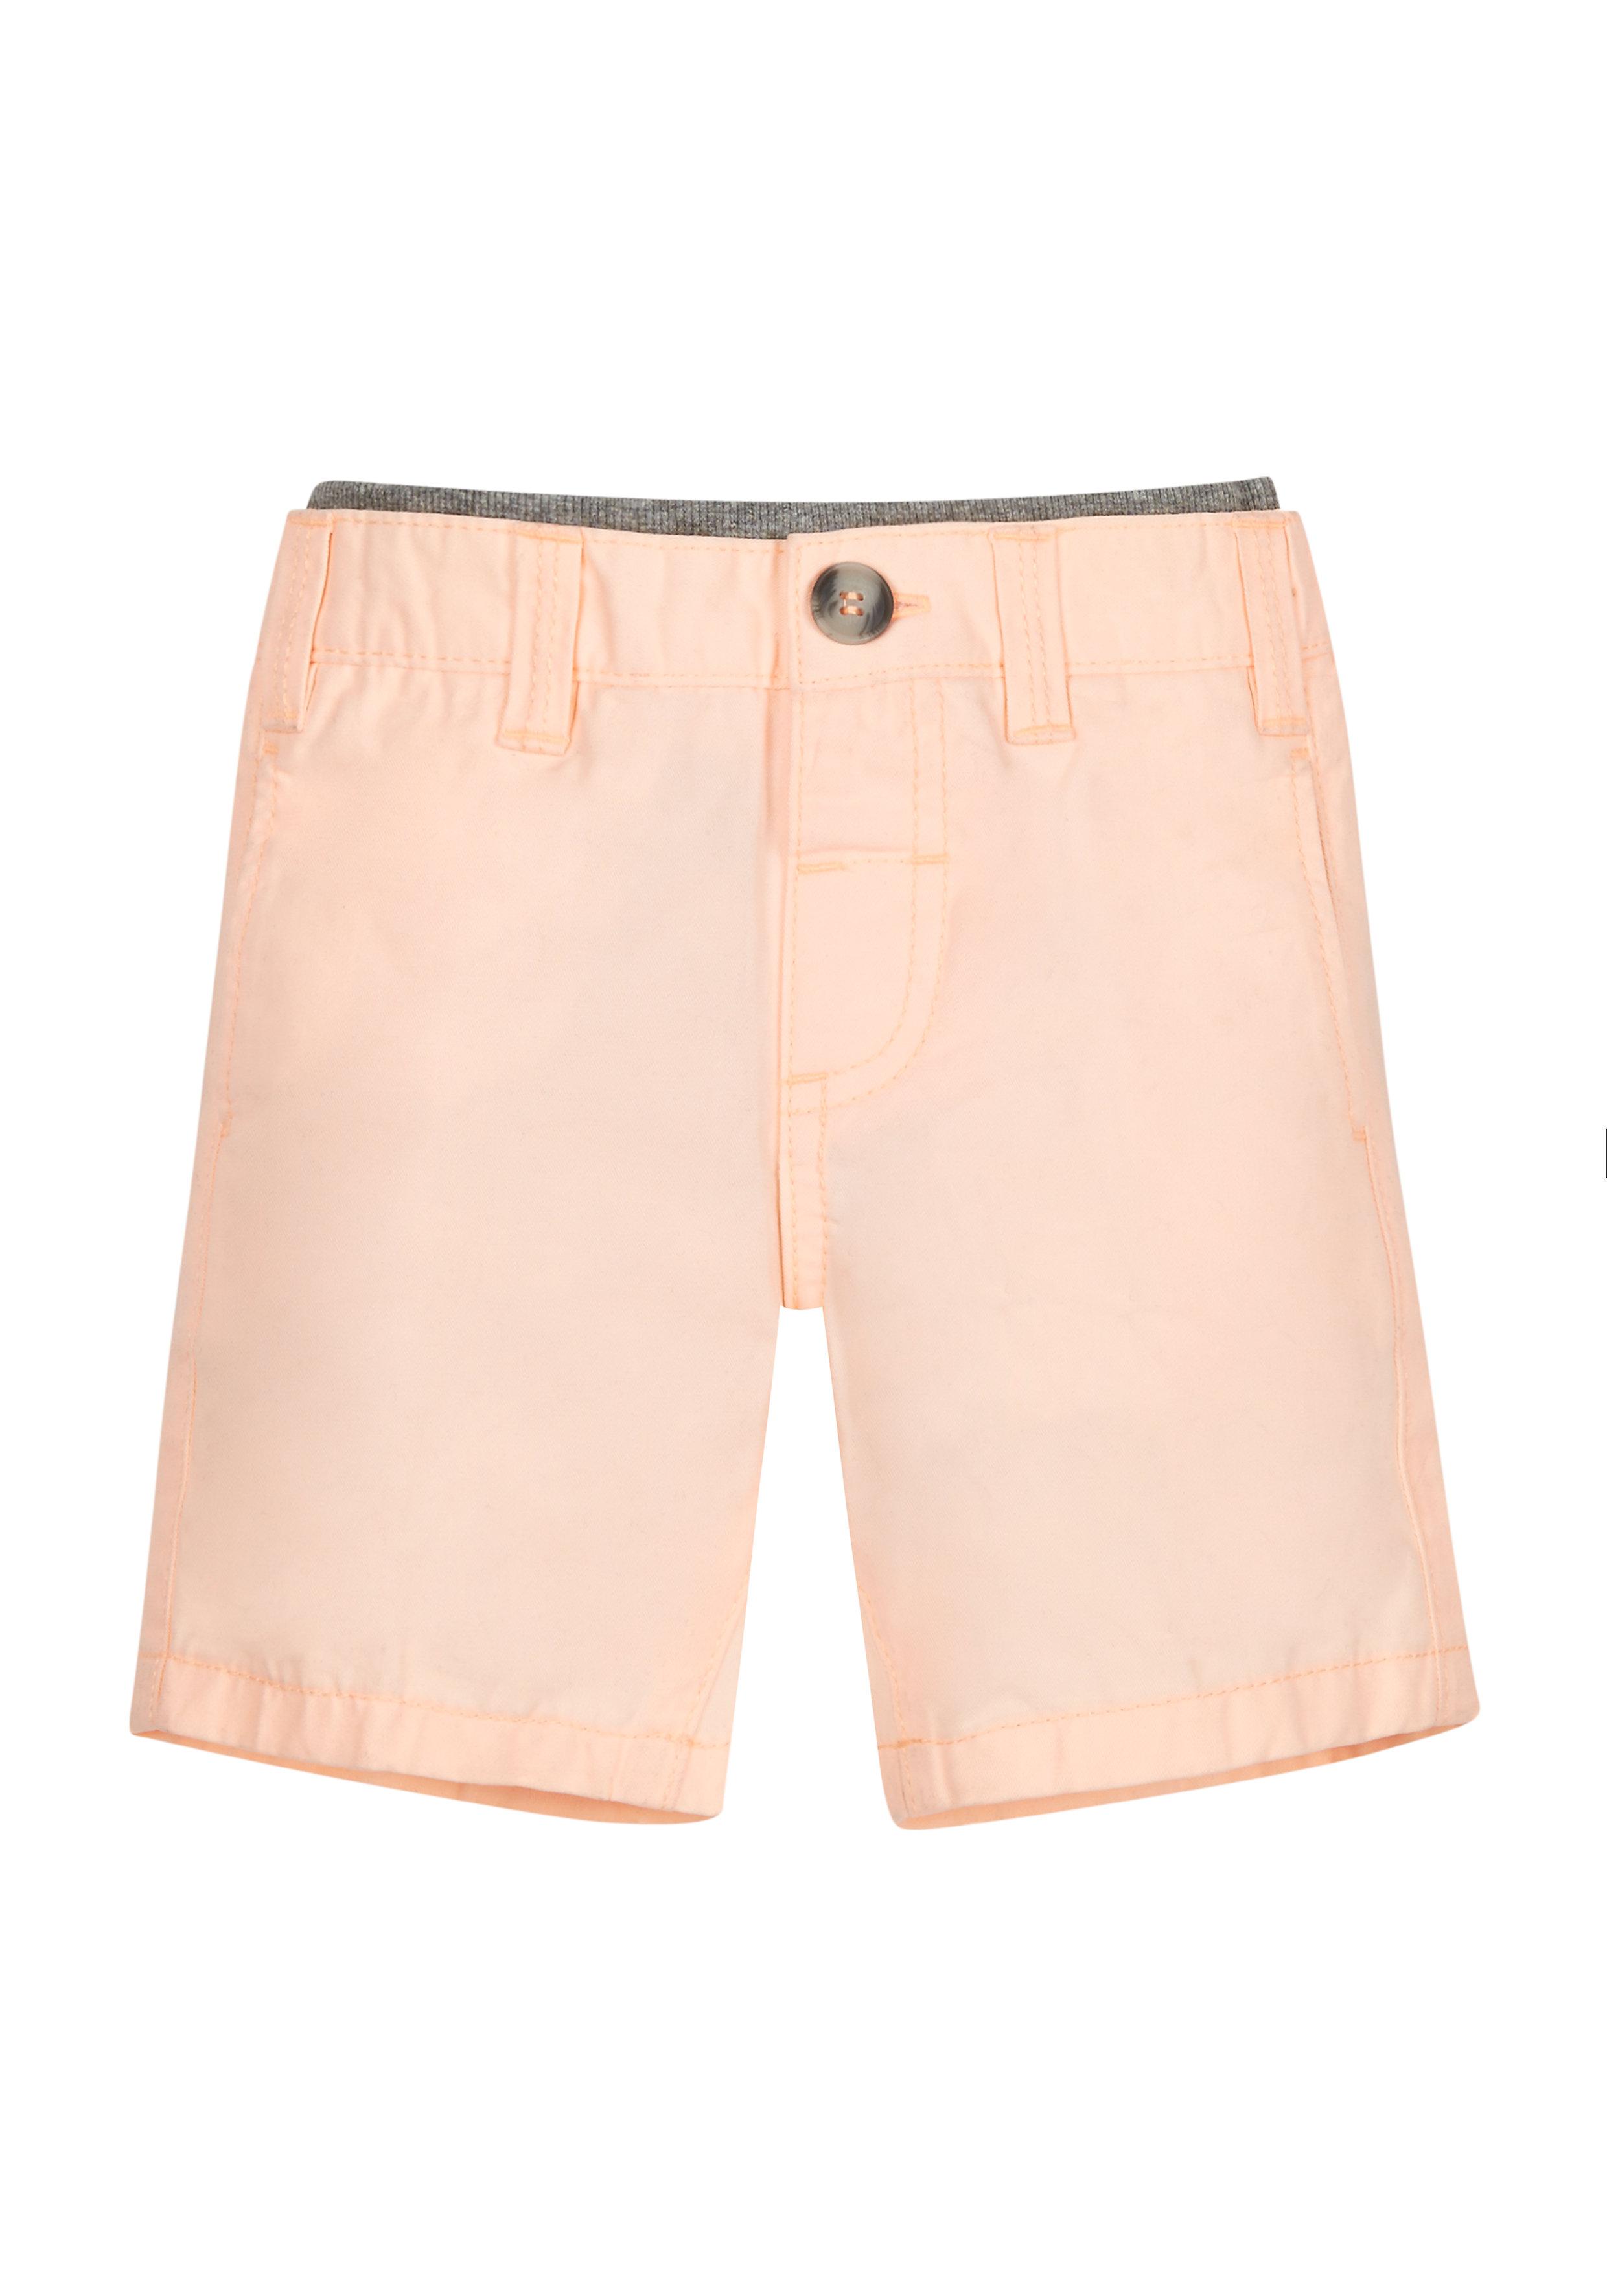 Mothercare | Boys Peach Chino Shorts - Orange